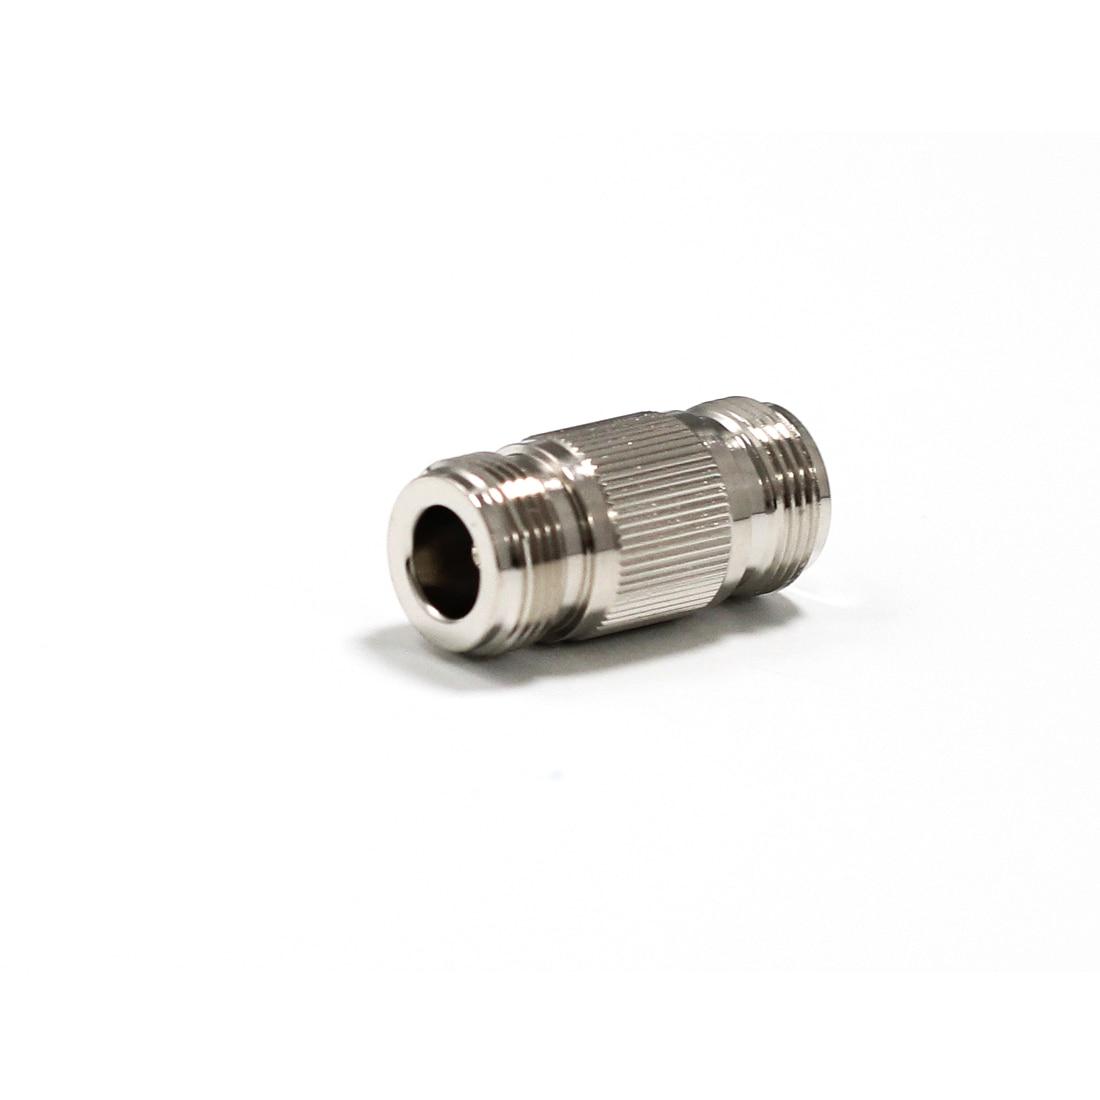 1pc N Female Jack to N Female Jack RF Coax Adapter convertor Connector Straight Nickelplated NEW wholesale